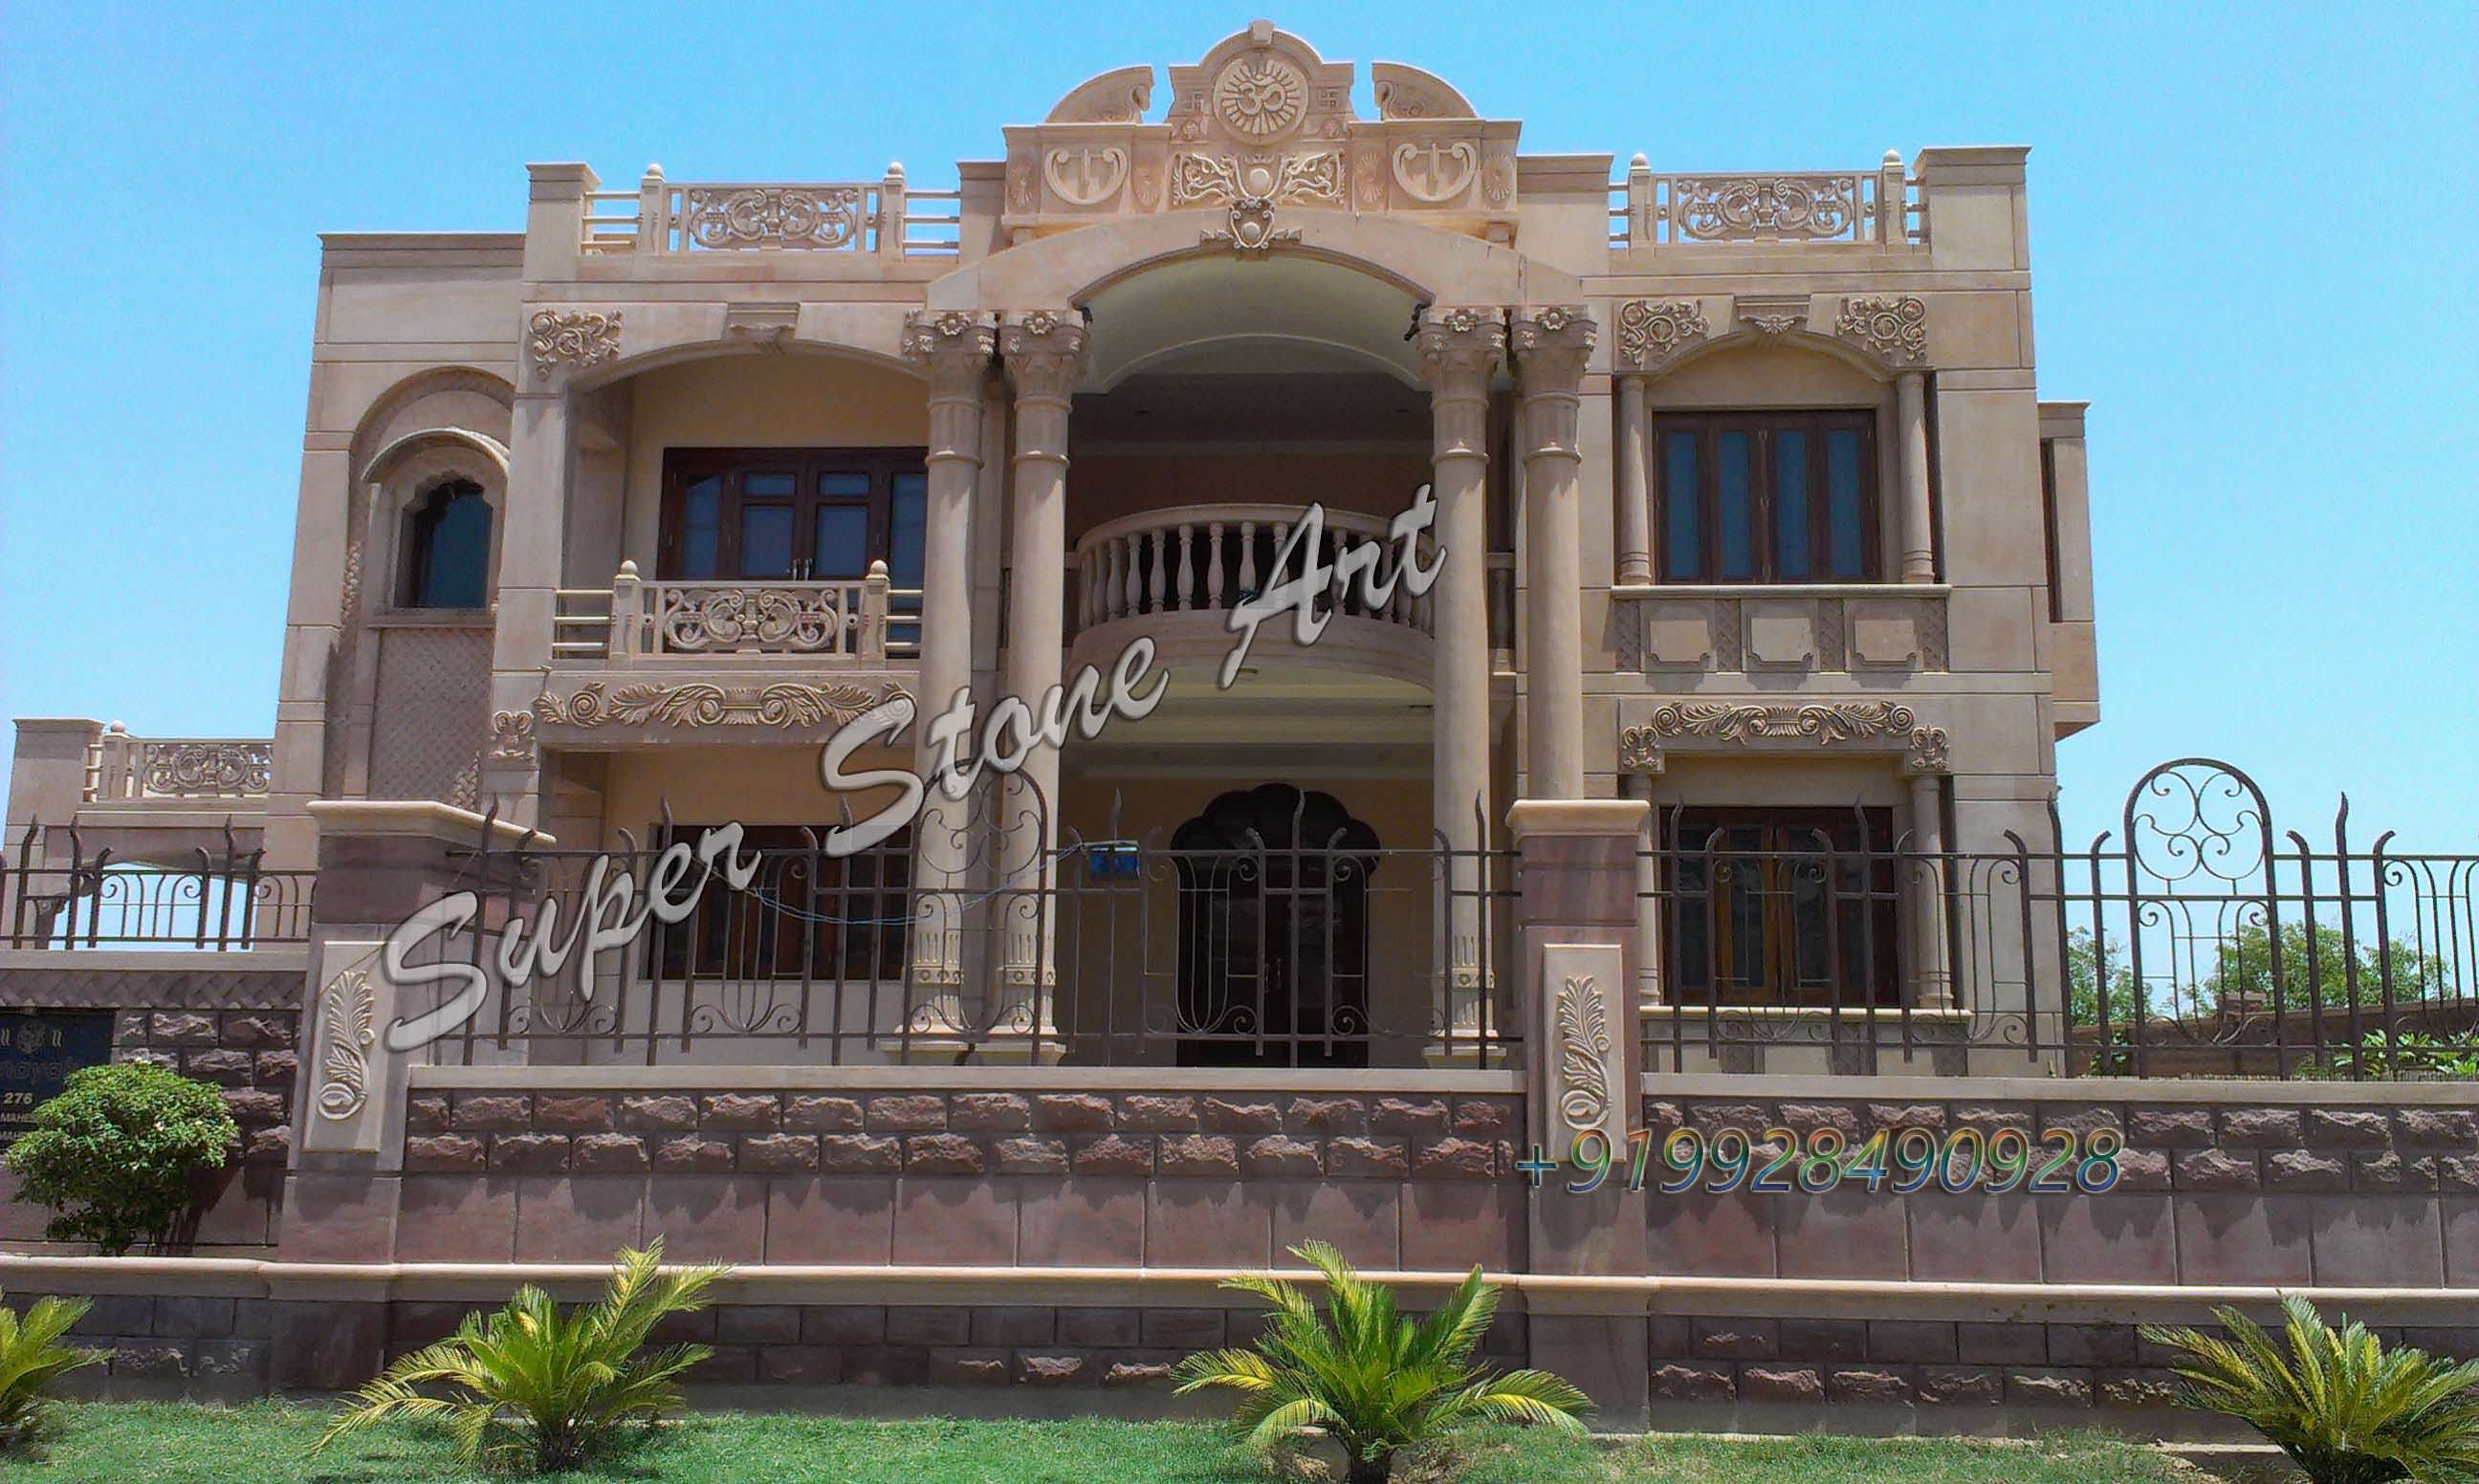 Front elevation designs jodhpur sandstone jodhpur stone art jodhpur stone all buiding design